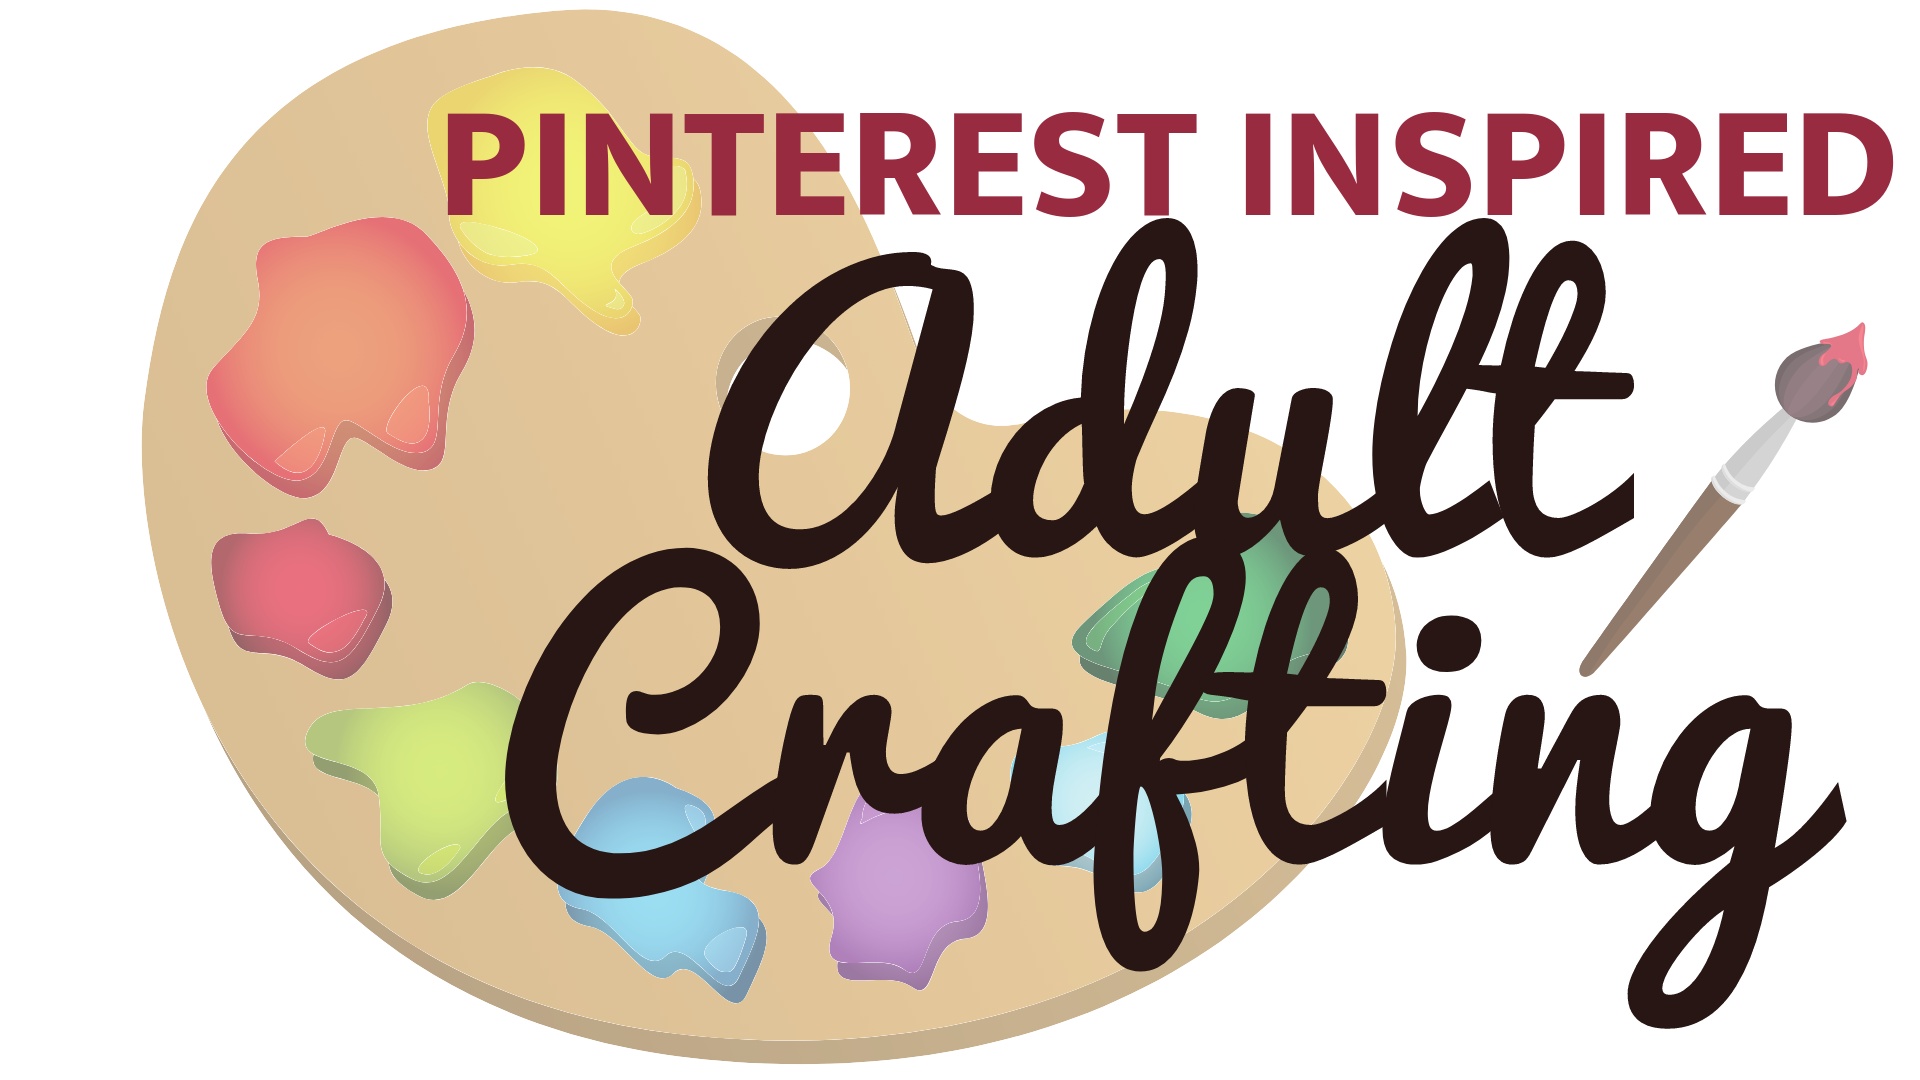 Pinterest Inspired Adult Crafting: Mason Jar Suncatchers